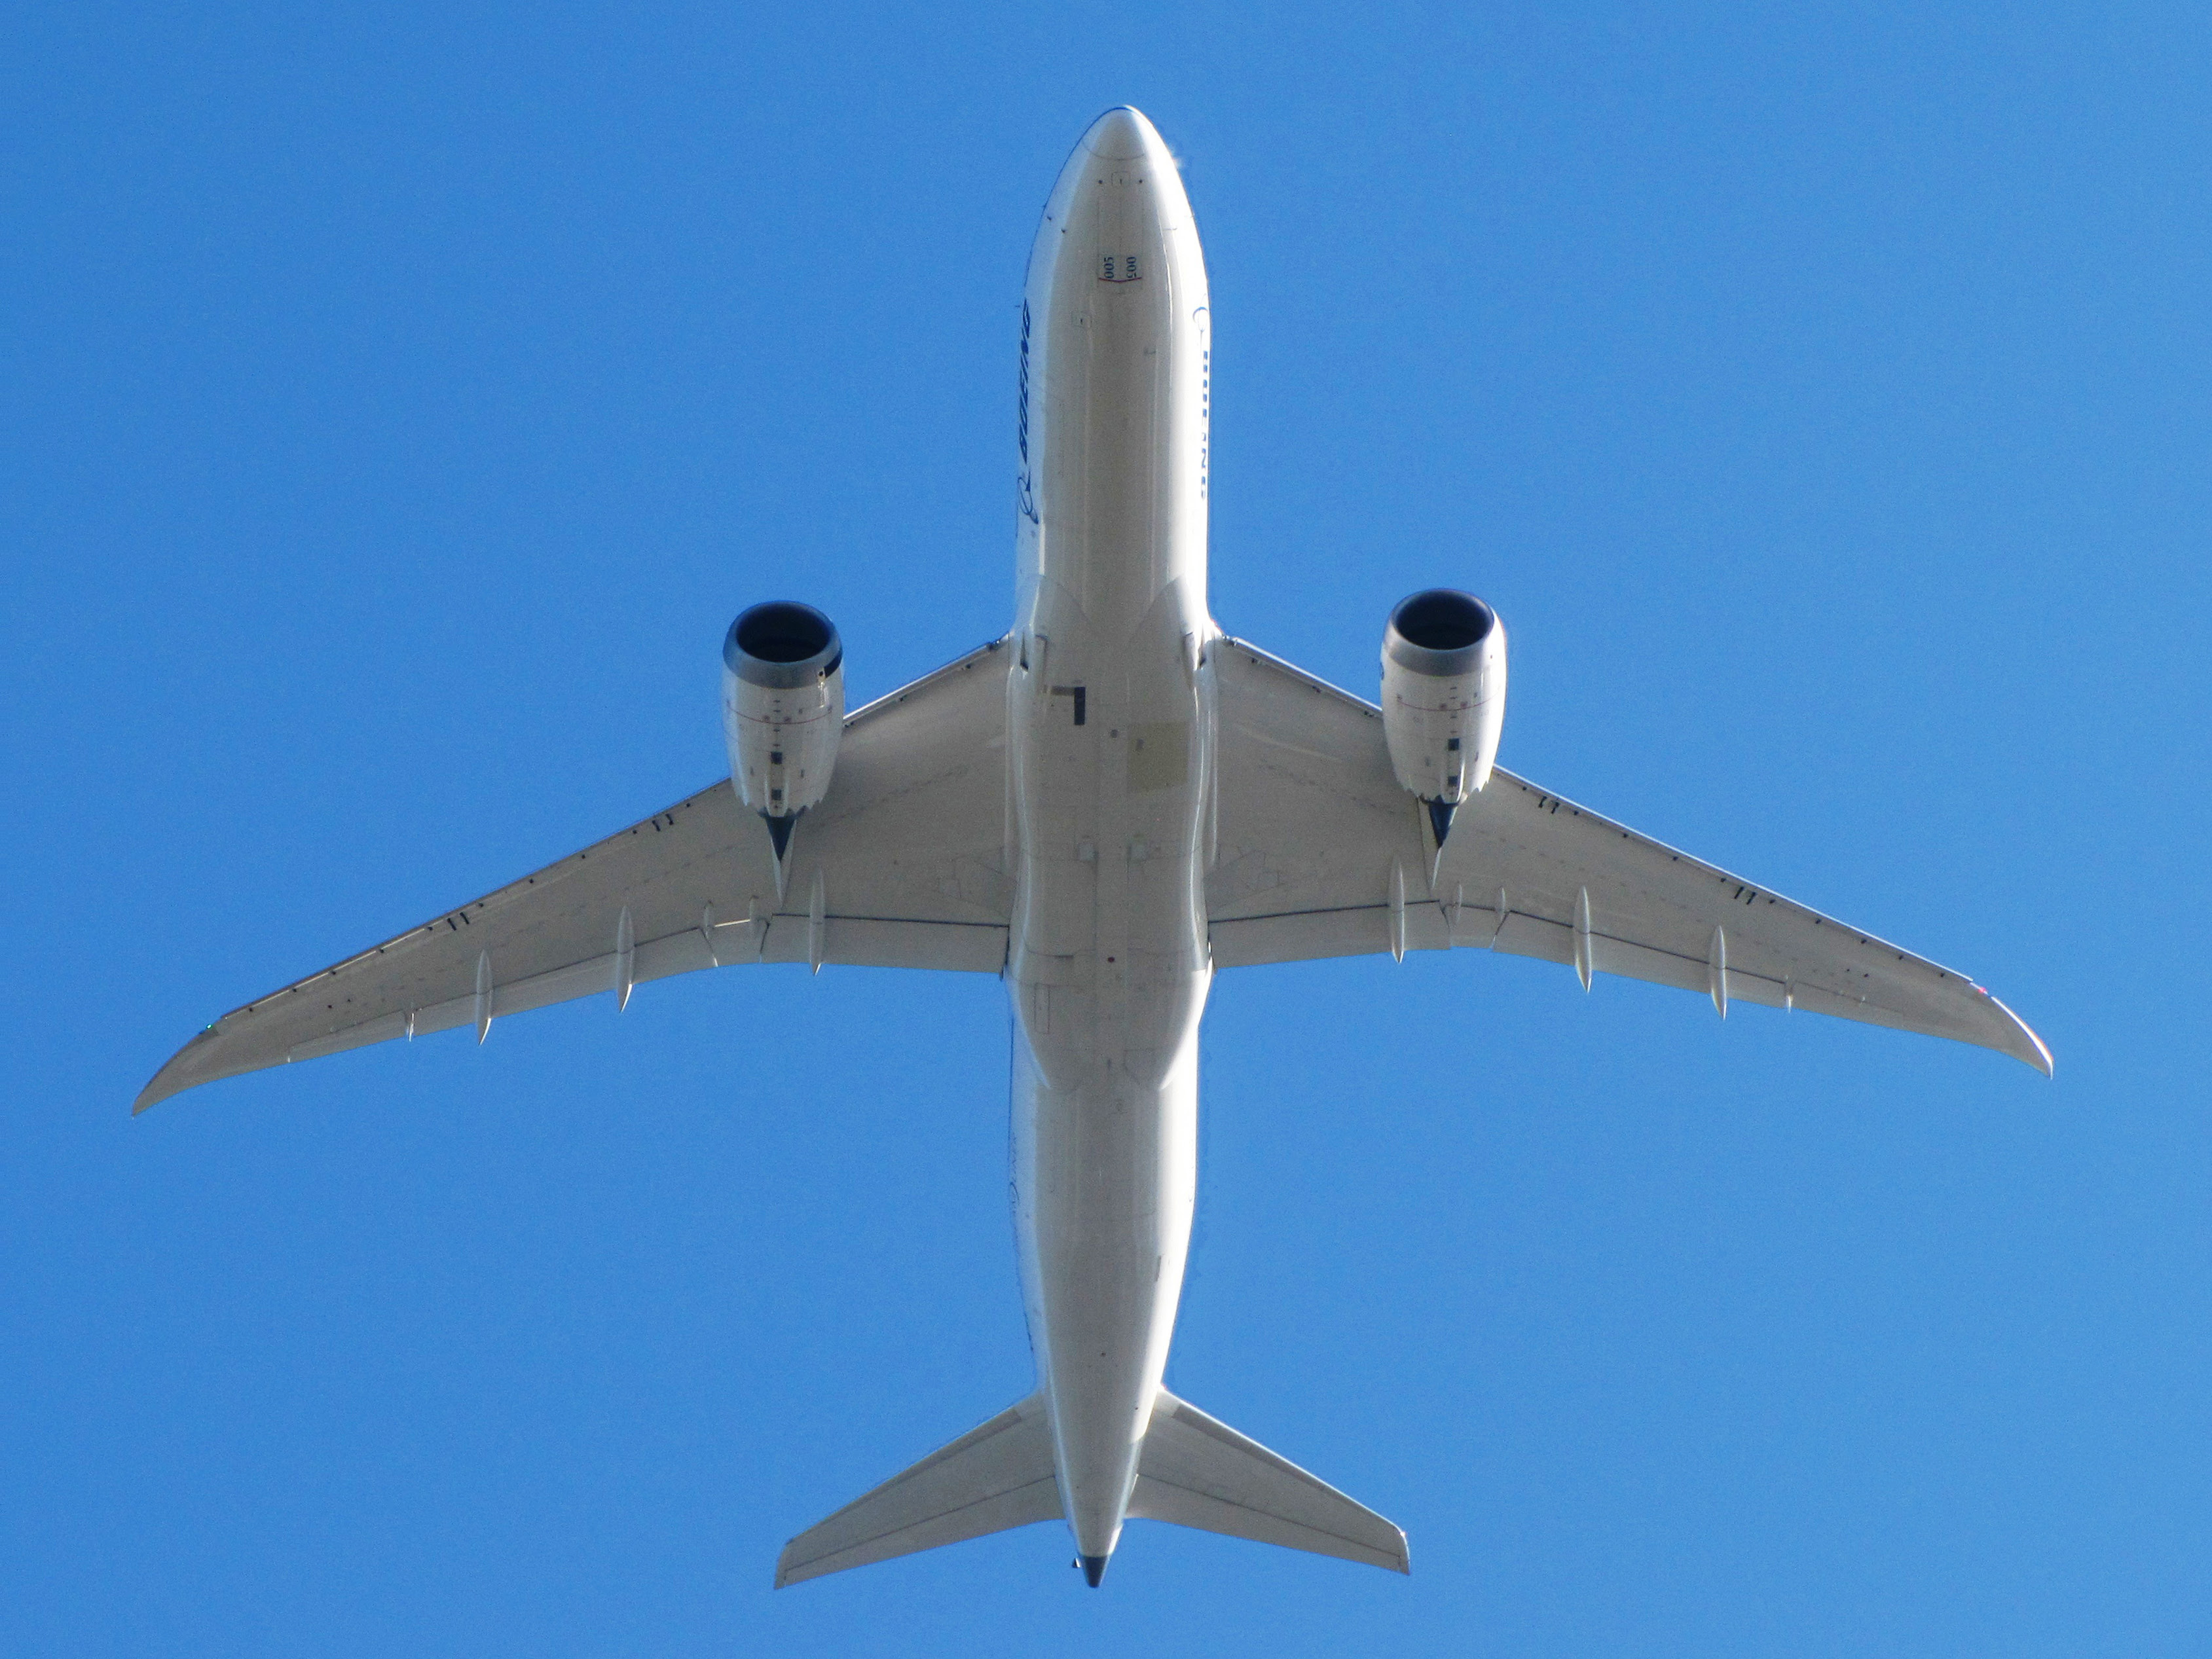 Boeing 787 Dreamliner - Wikipedia, the free encyclopedia